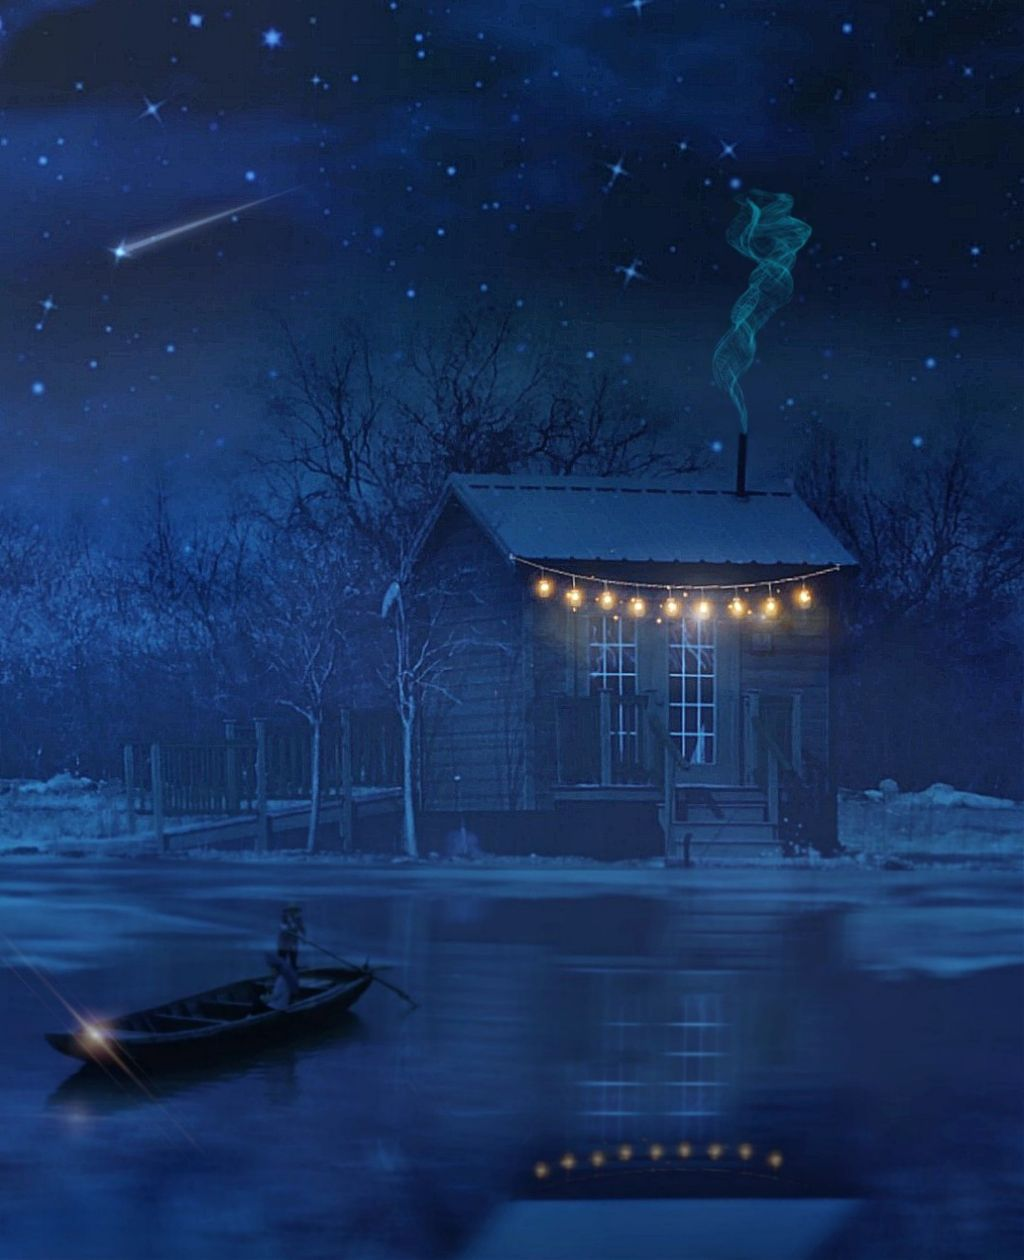 #freetoedit #irccabin #cabin #lake #nightsky #house #boat #reflections #stars #shootingstars #nightphotography #nightlife #nightlights #madewithpicsart #picsarteffects #myeditoffreetoedit #myedit #myremix